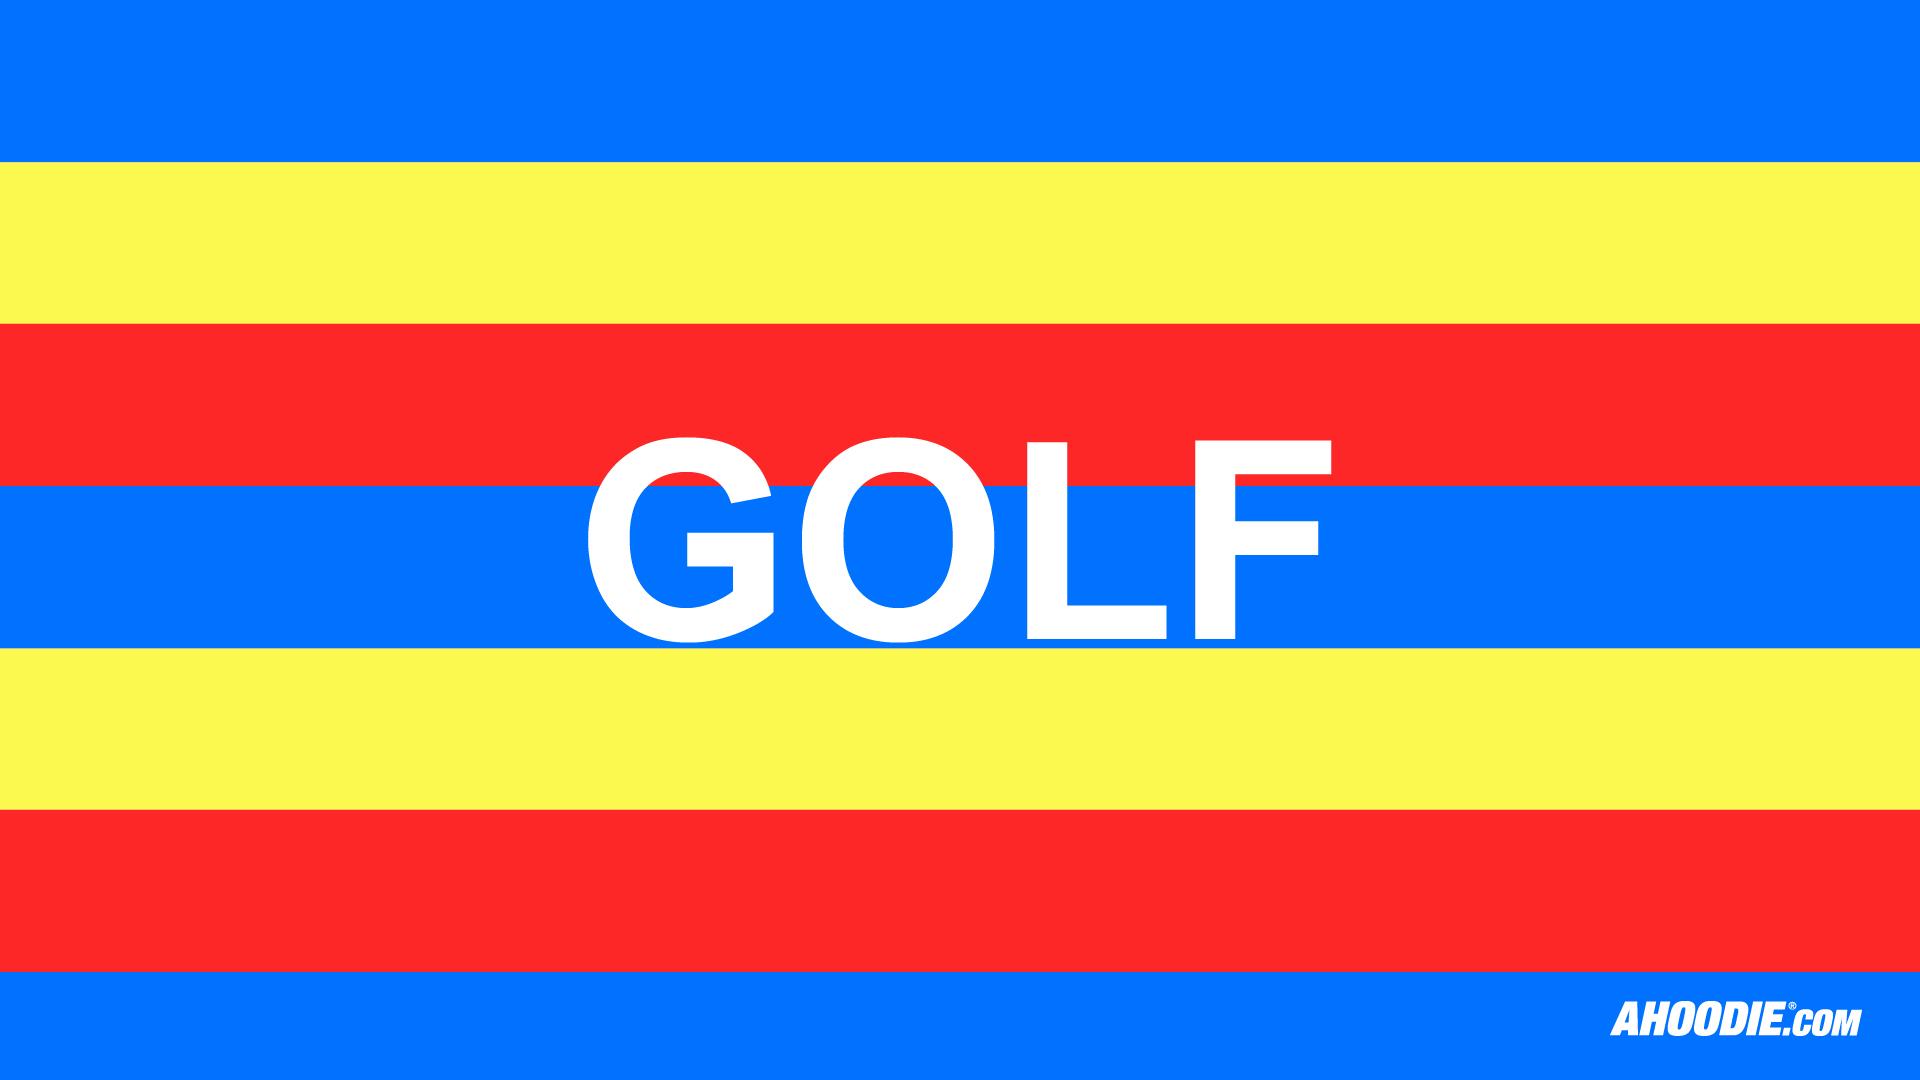 Odd Future Golf Wallpaper